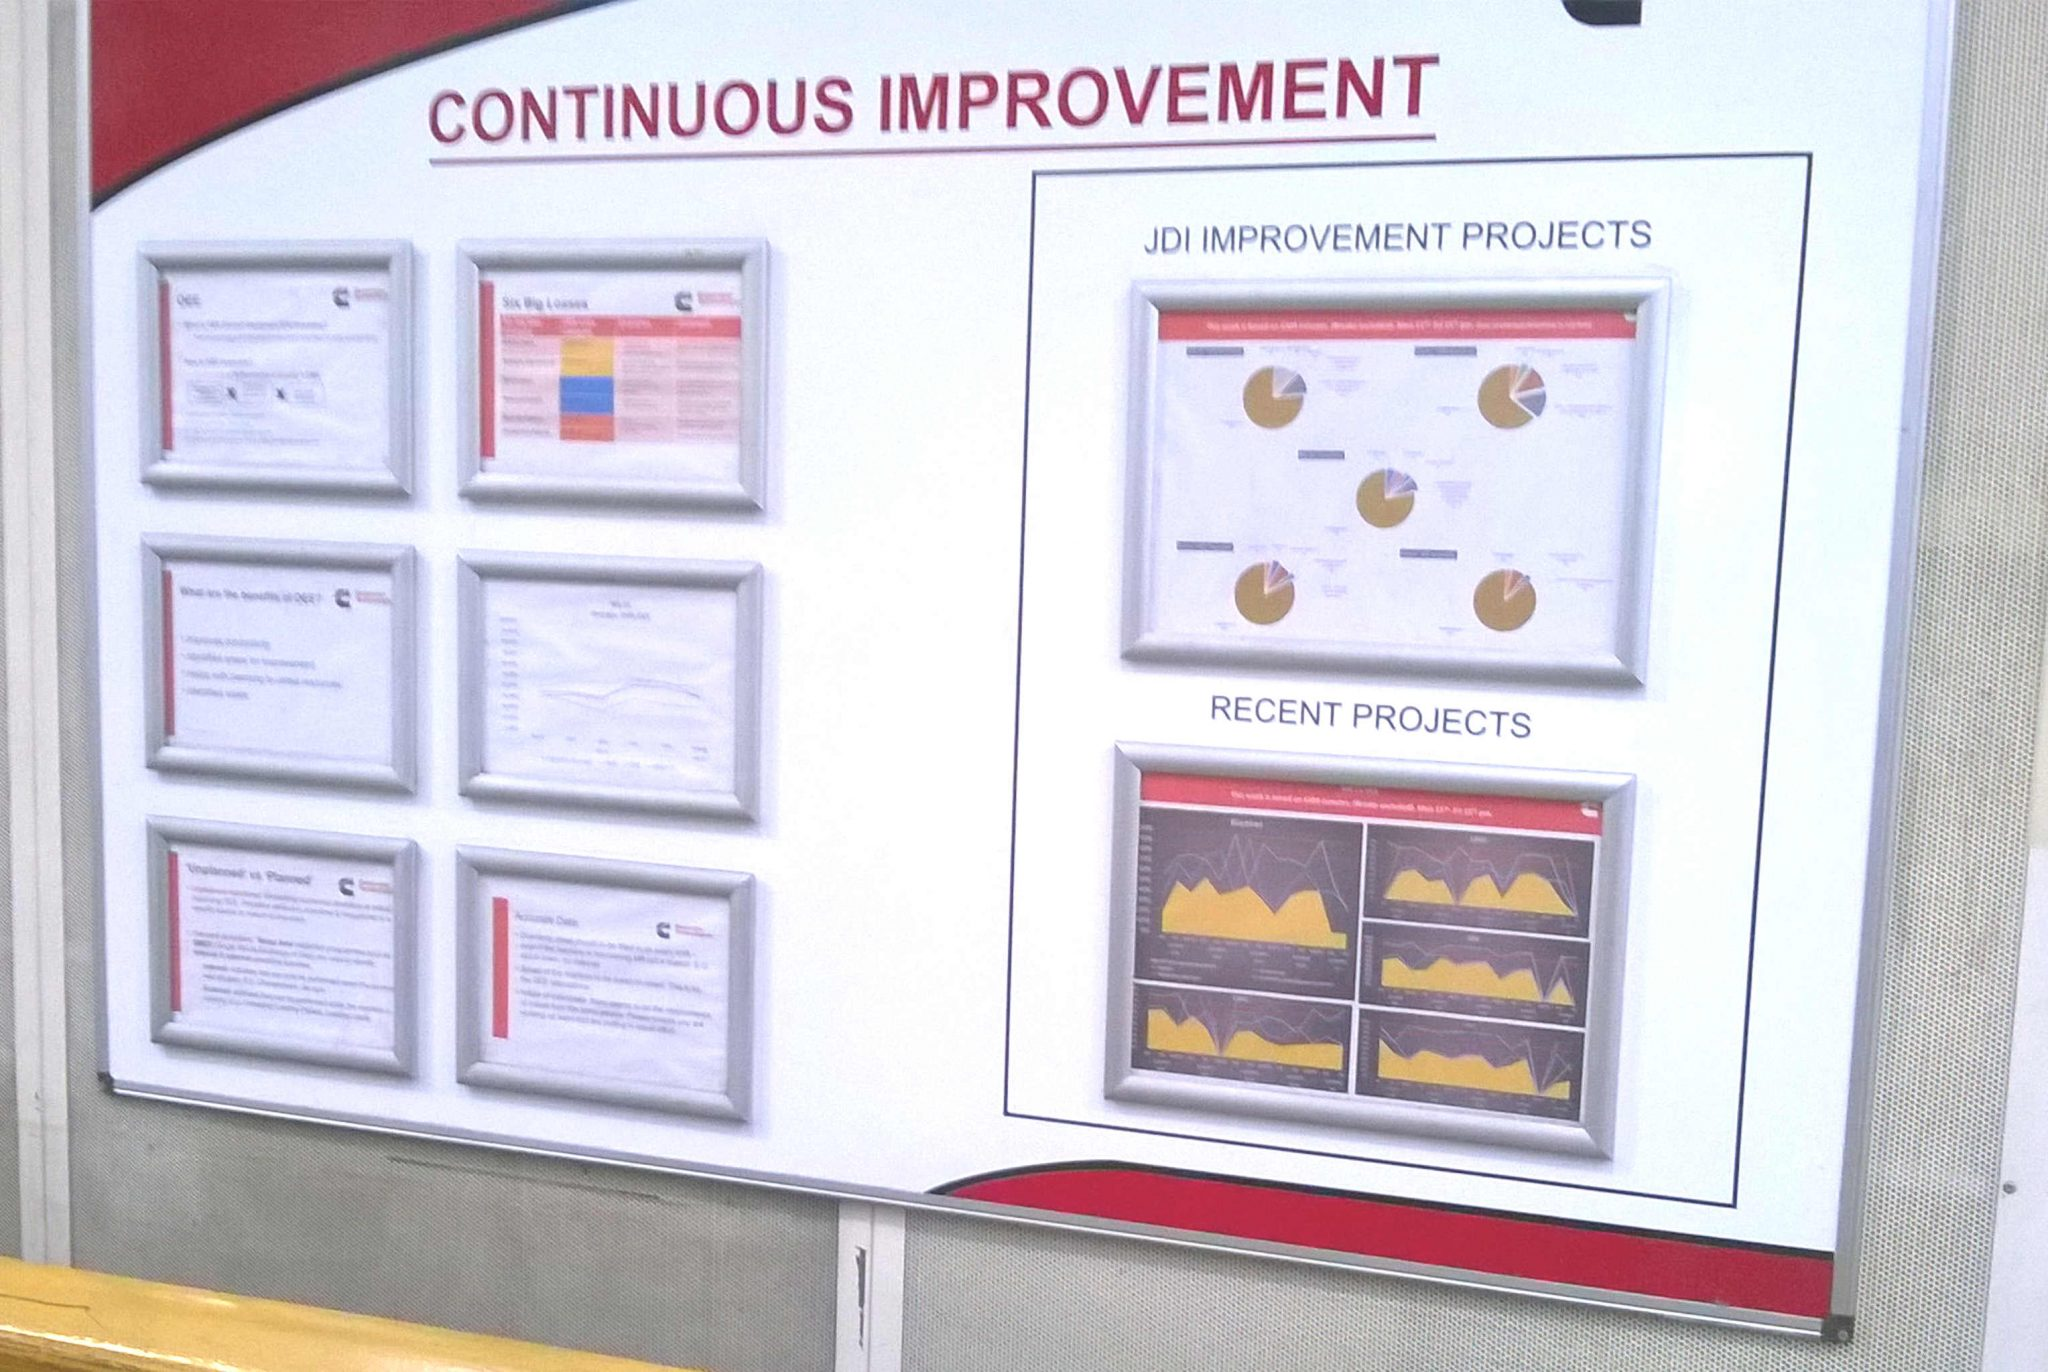 Continuous improvement board